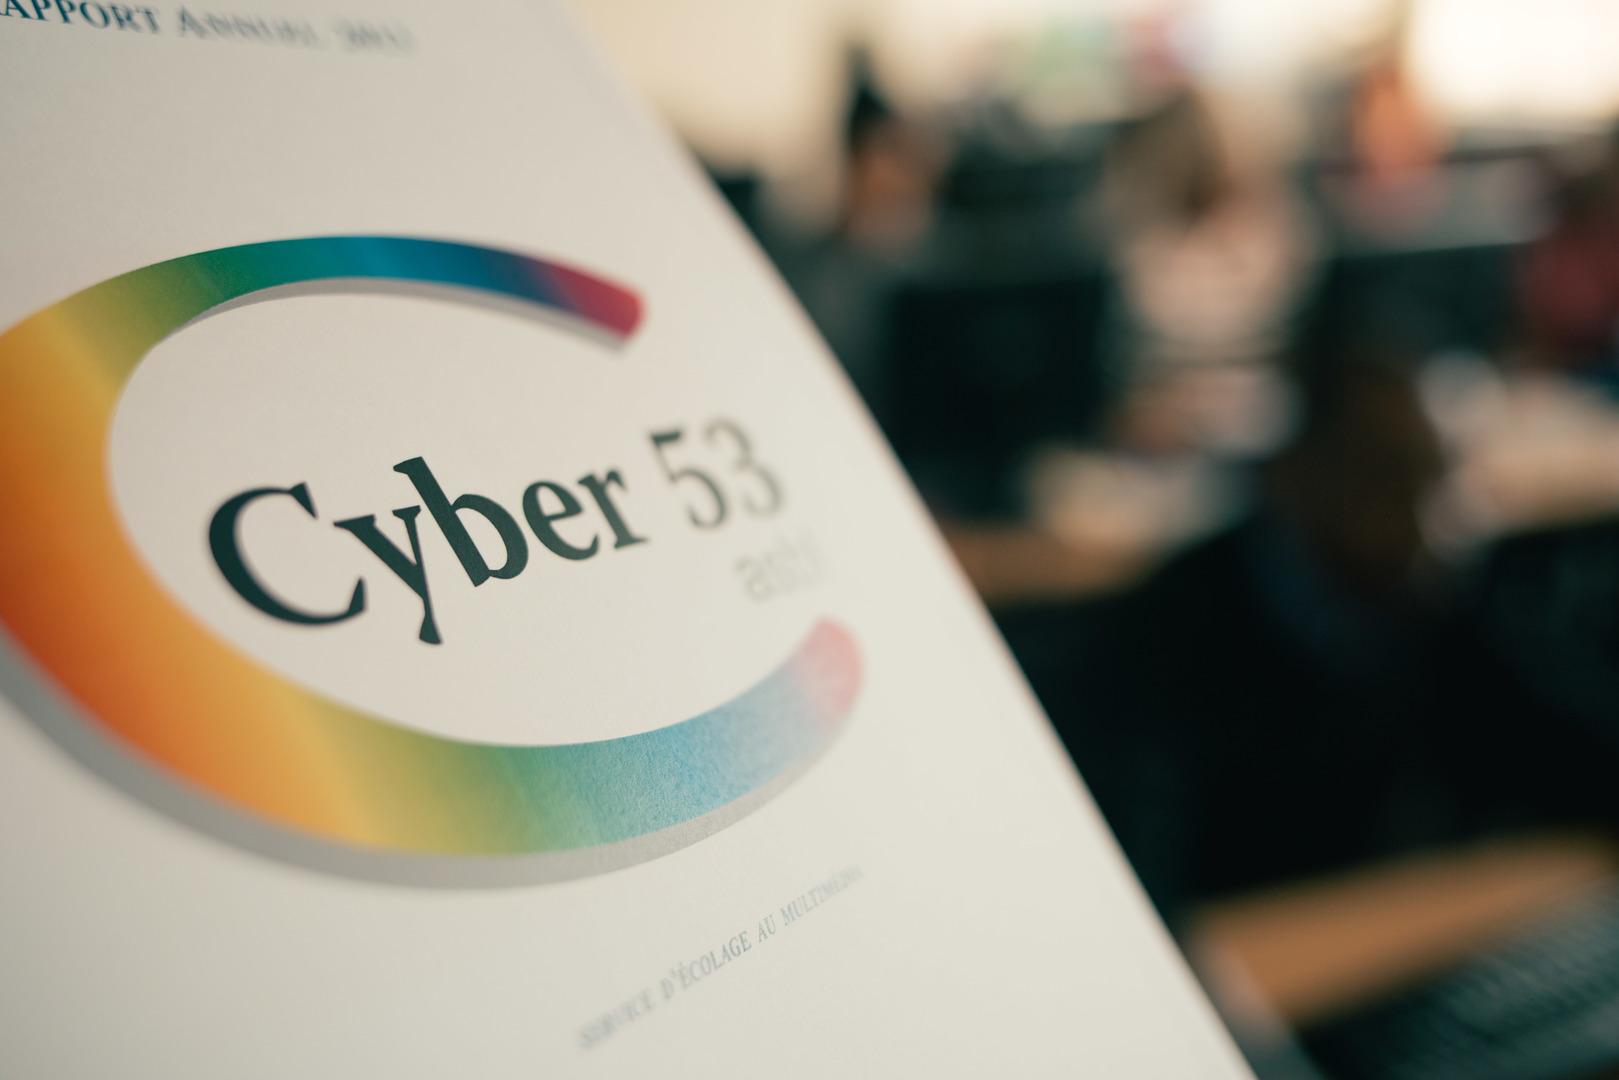 Cyber-53_46